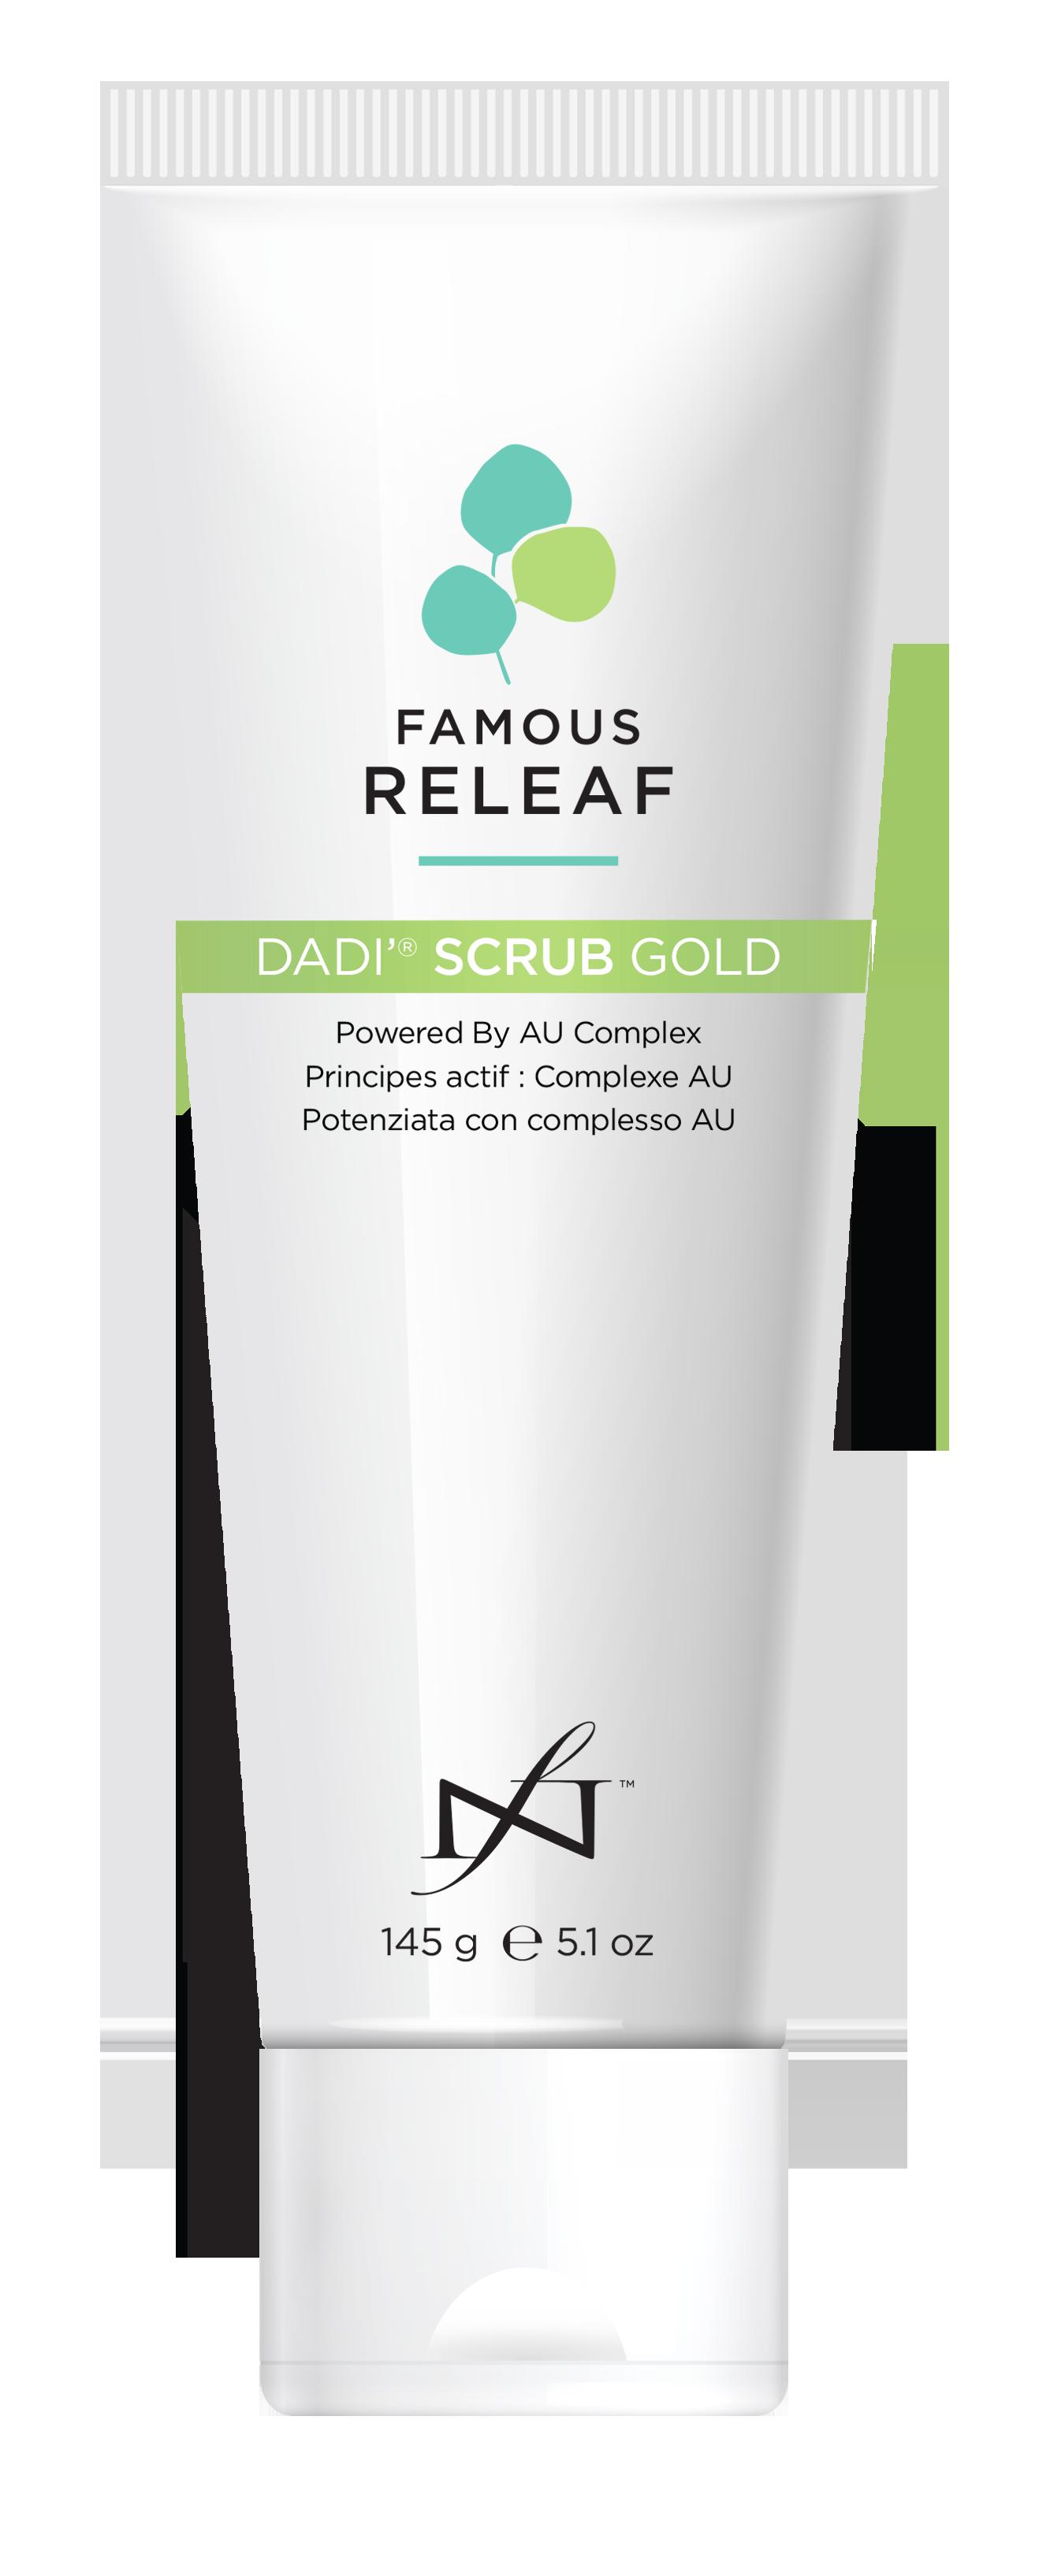 Dadi' Scrub Gold 145g